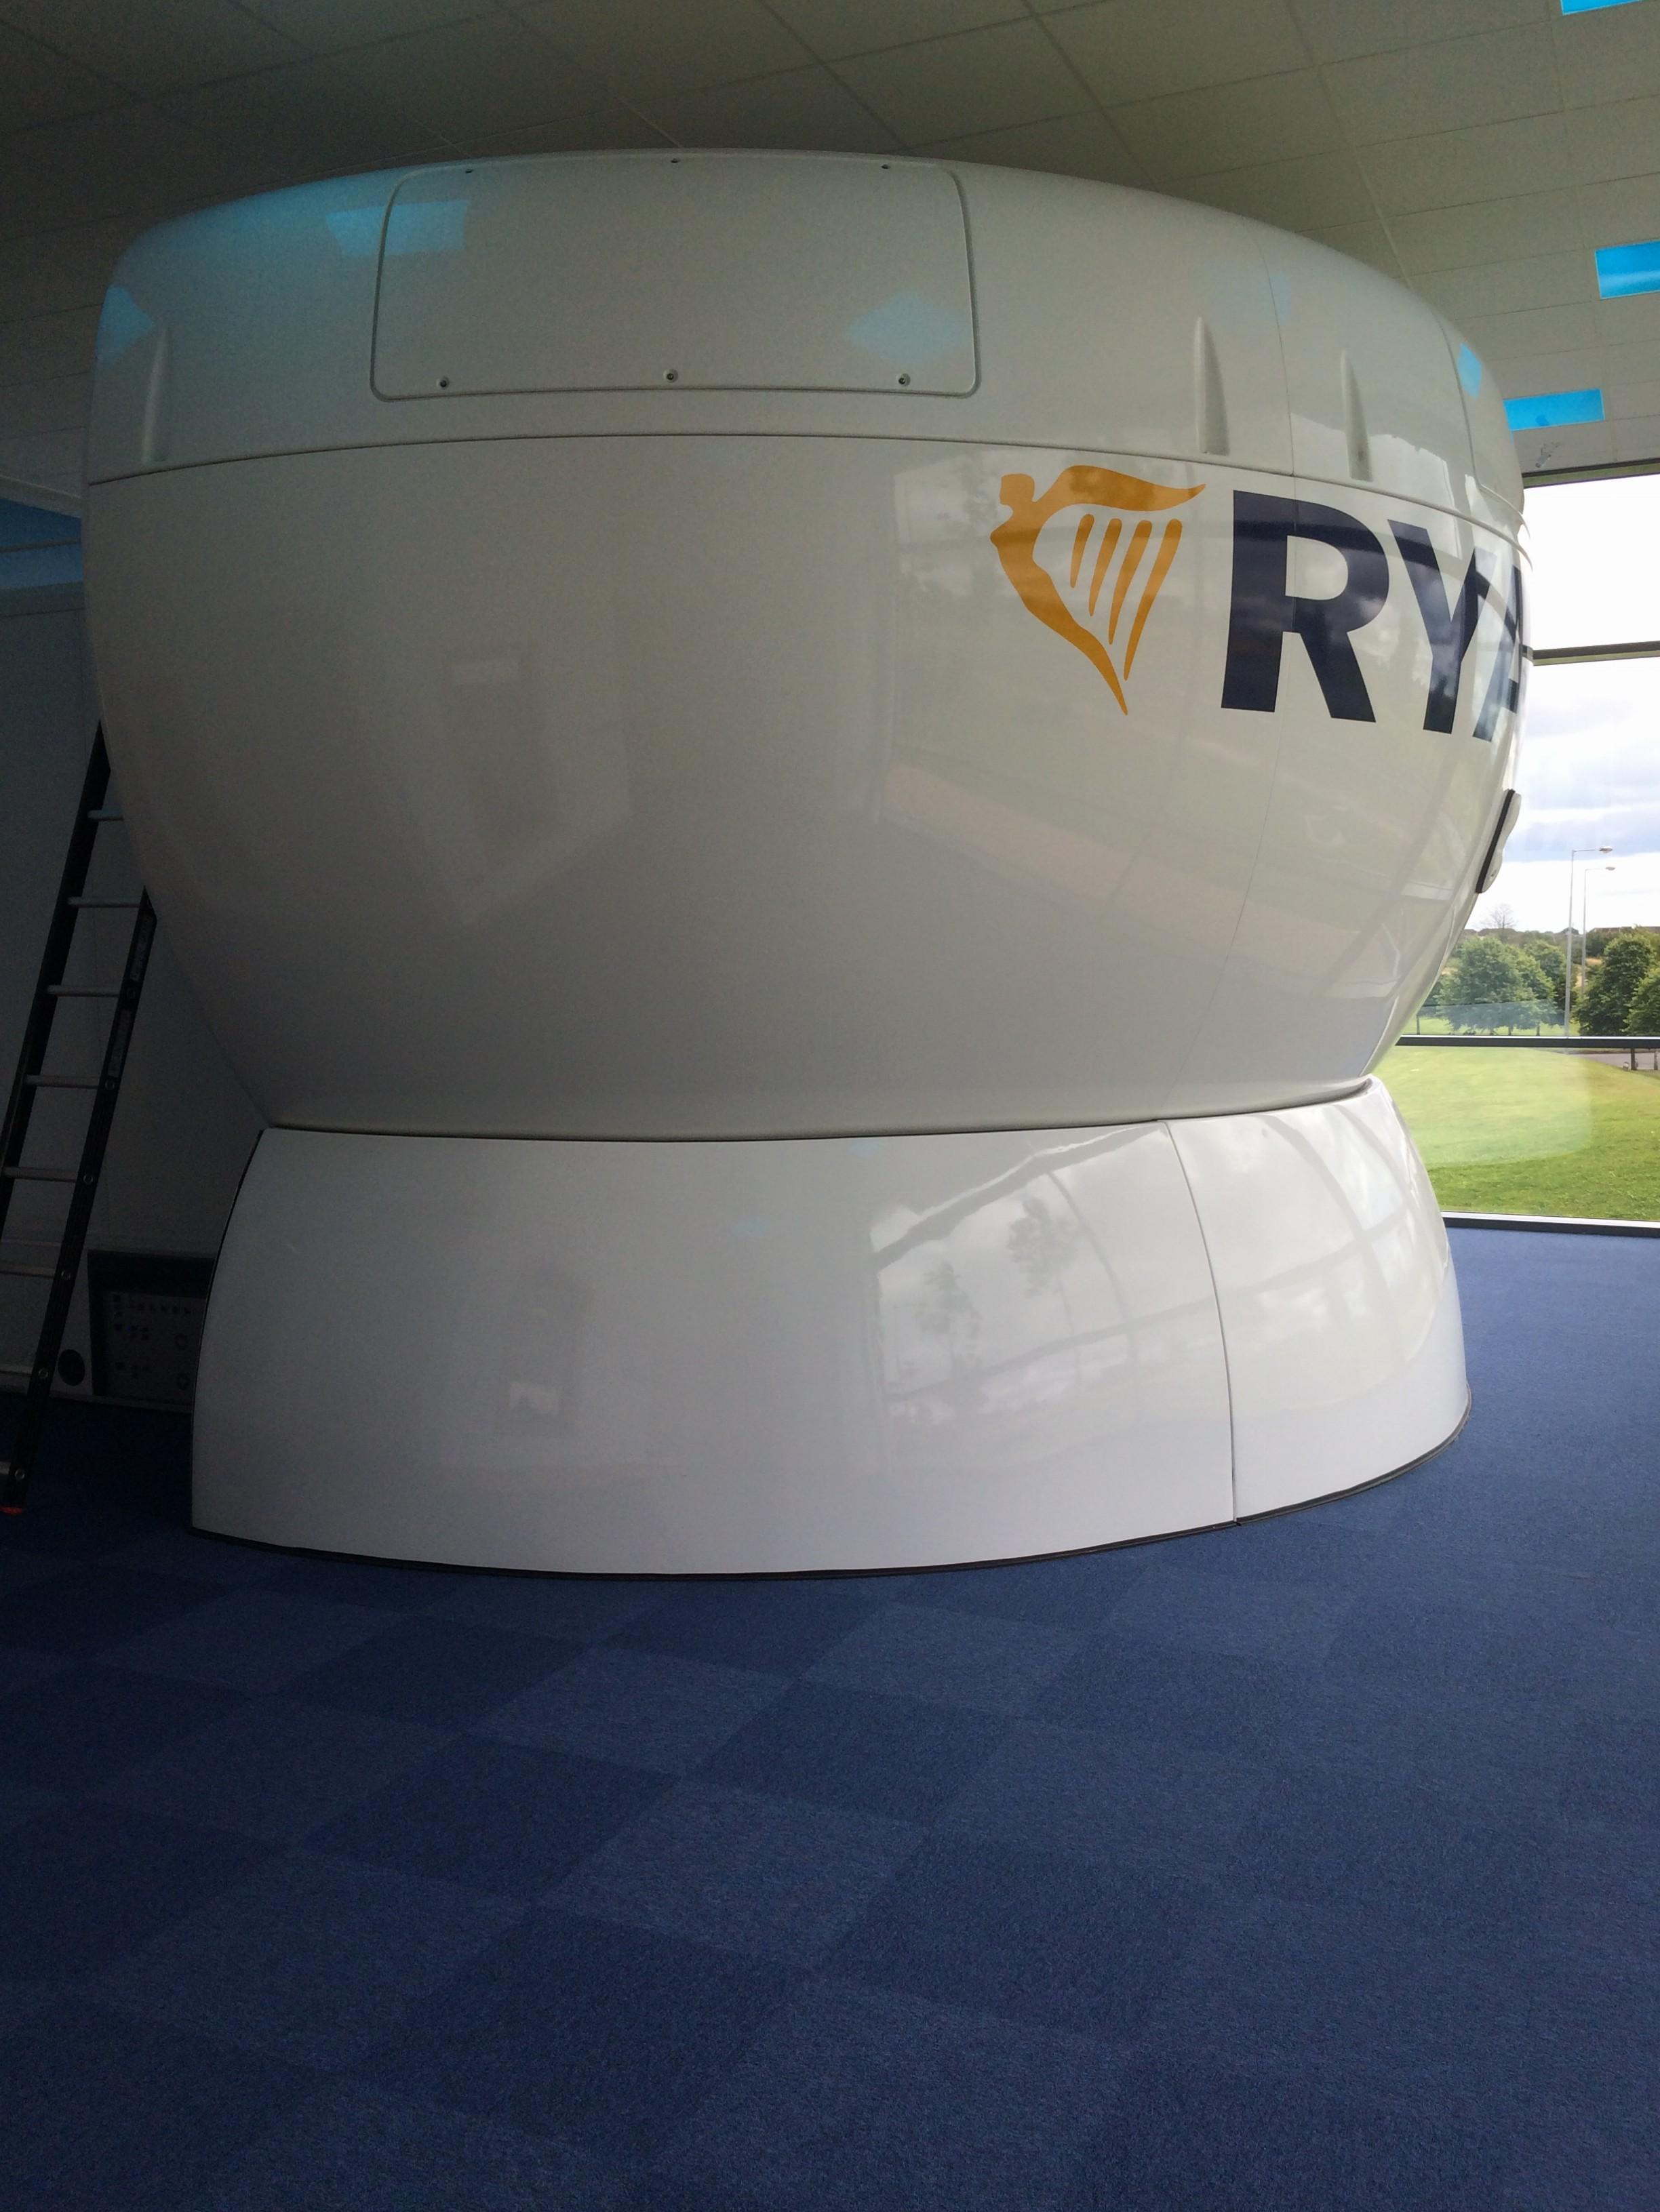 JohanAero » Ryanair Pilot Assessment Day (Feedback)